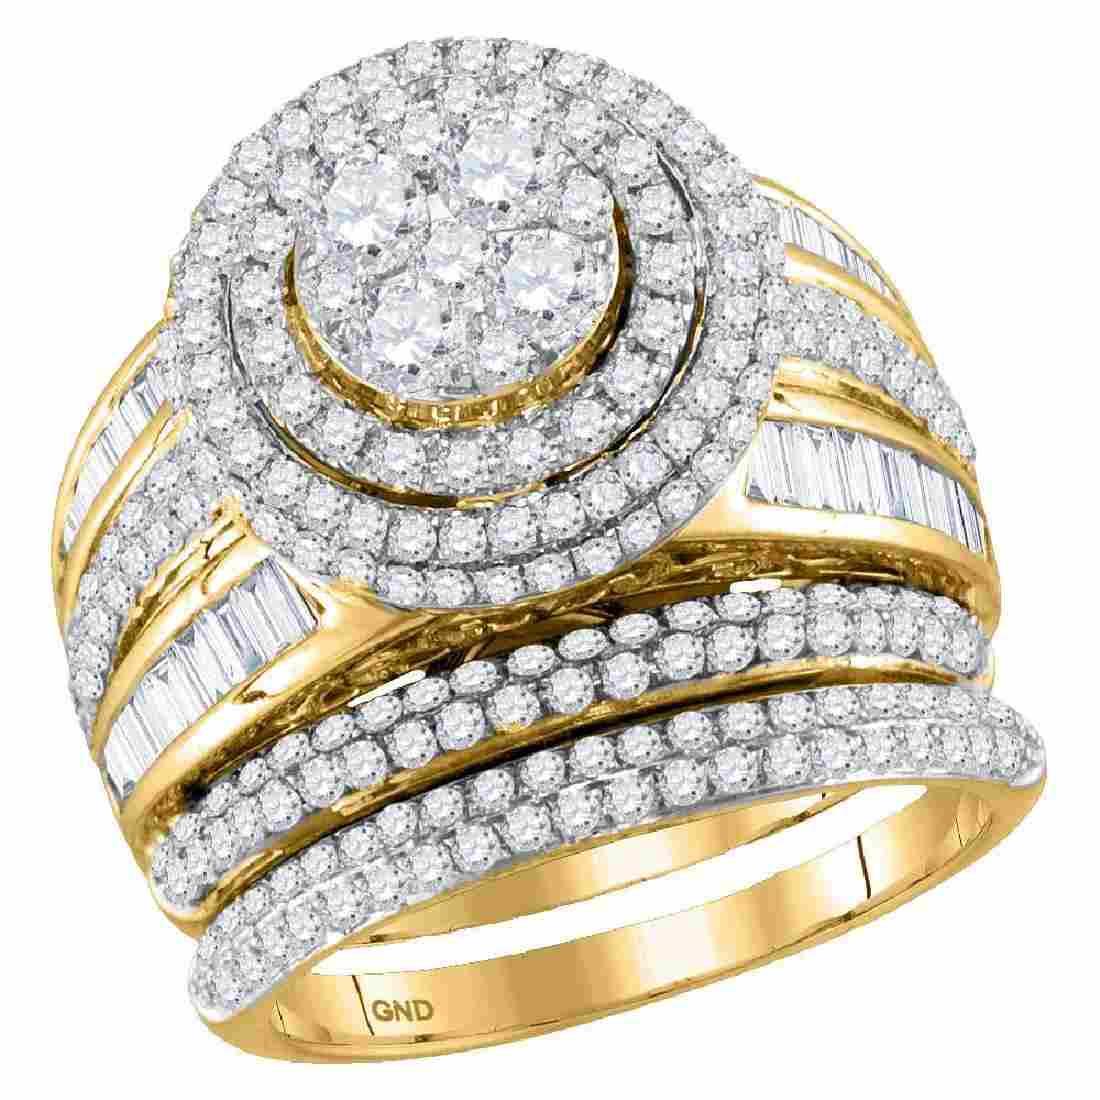 Diamond Cluster Bridal Wedding Engagement Ring 14kt